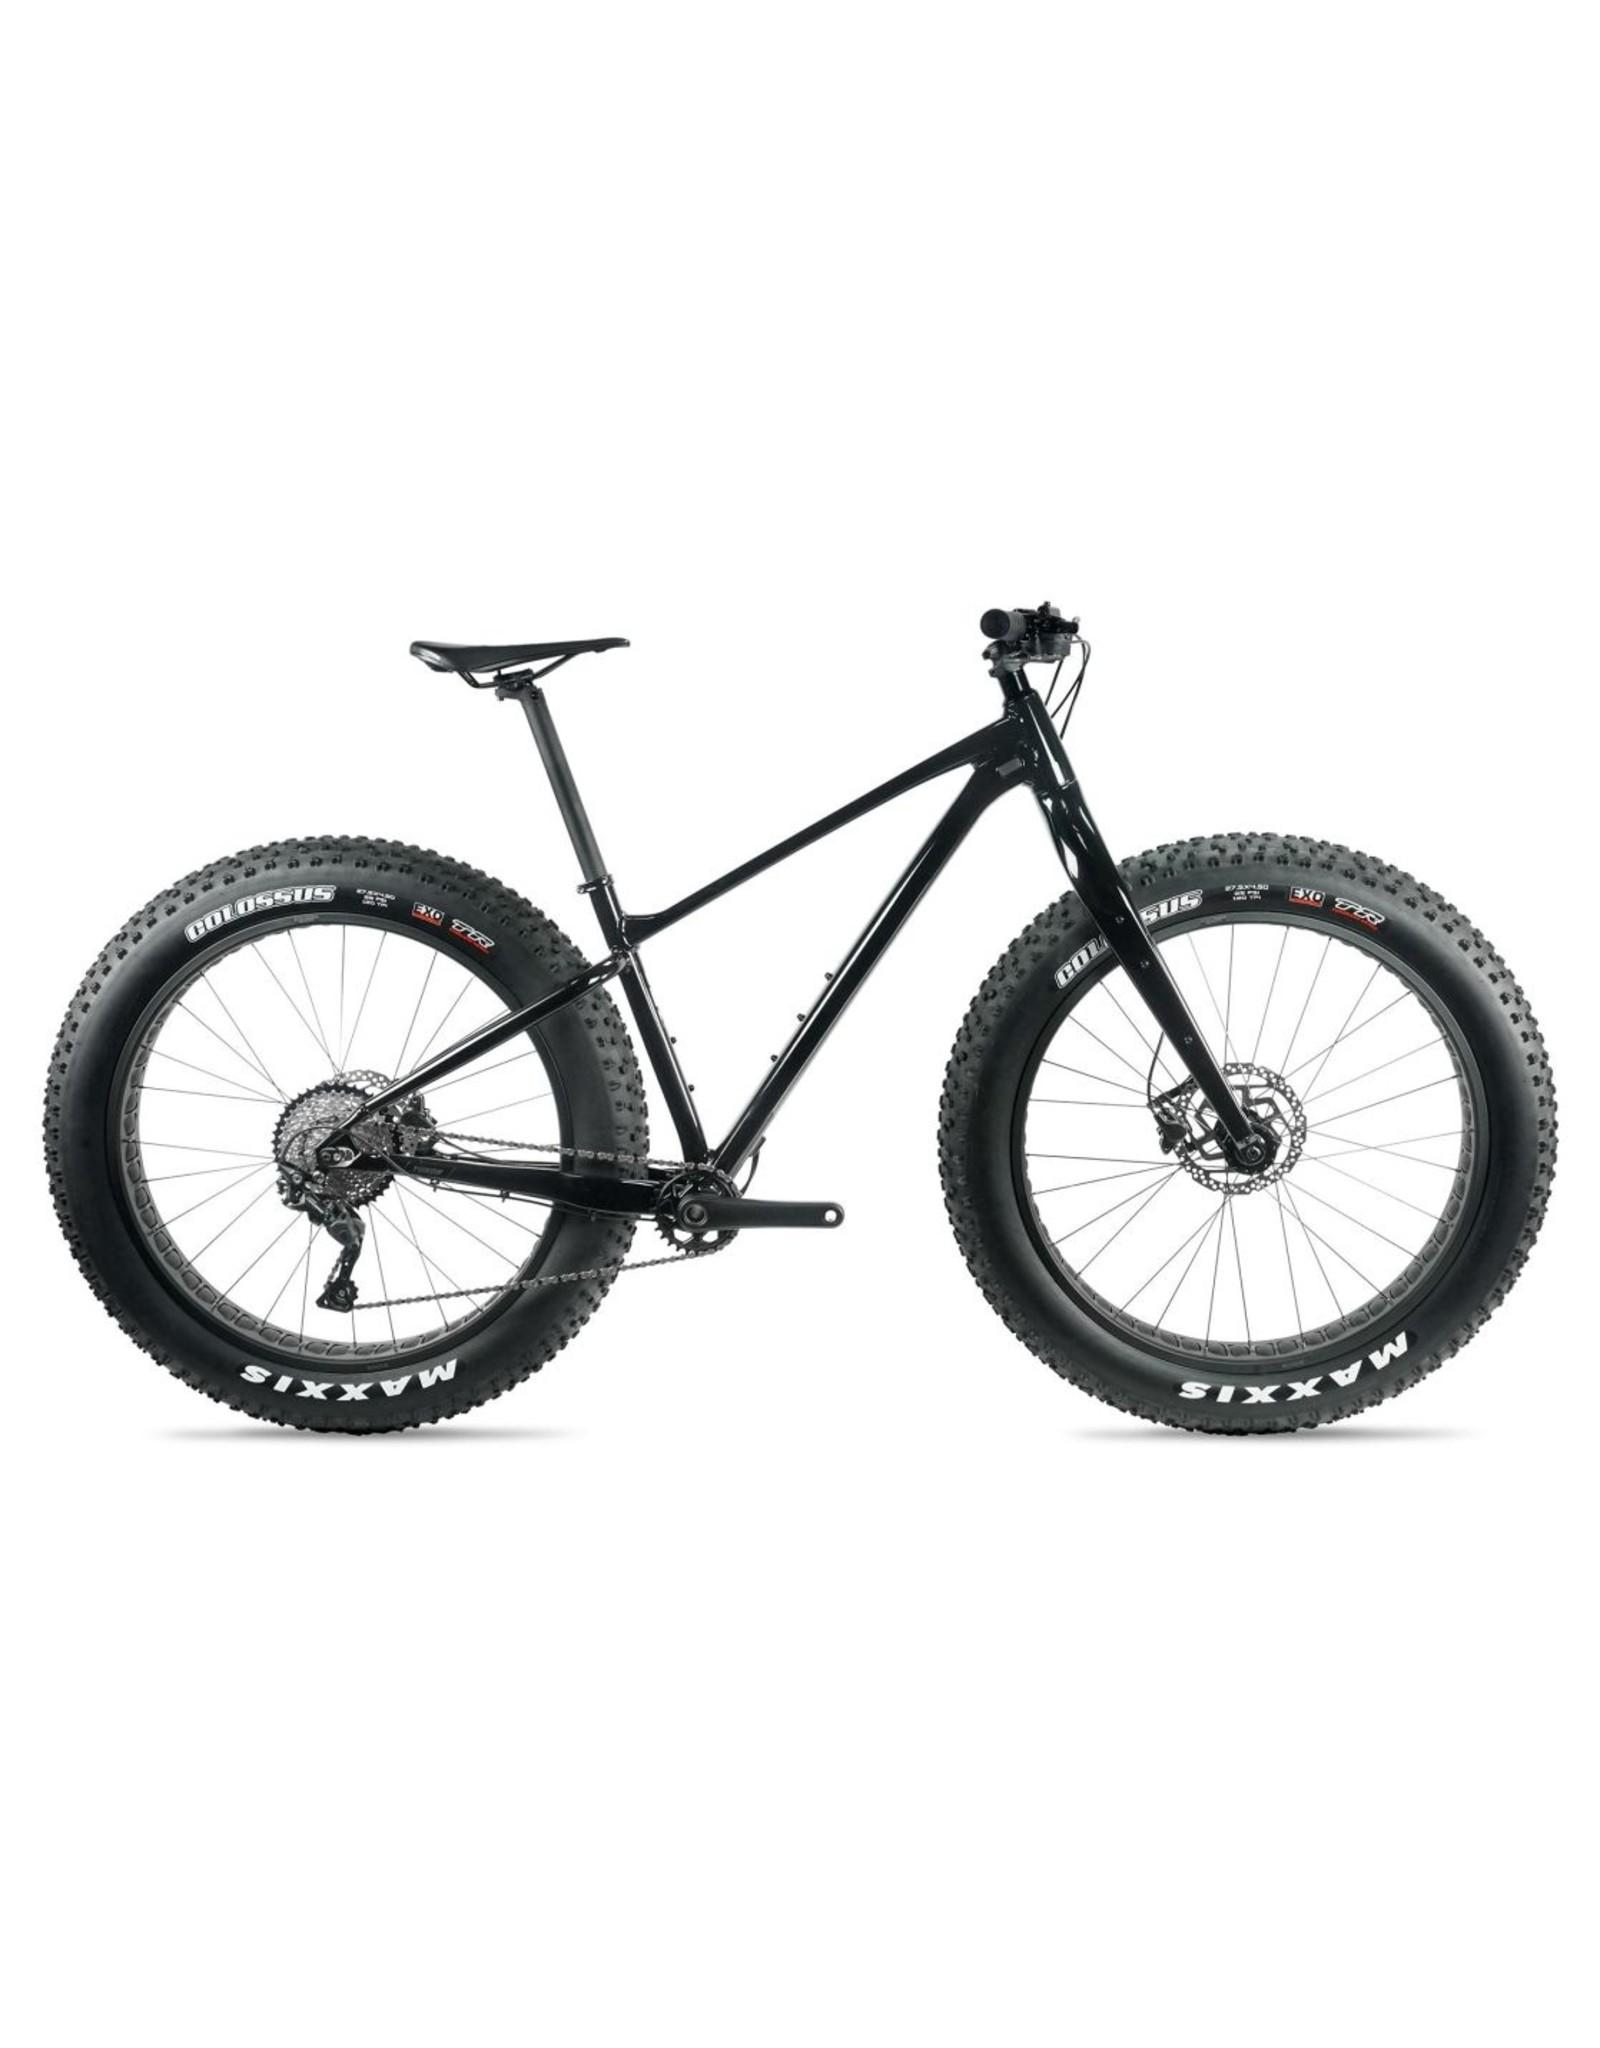 Giant Yukon 2 S Black